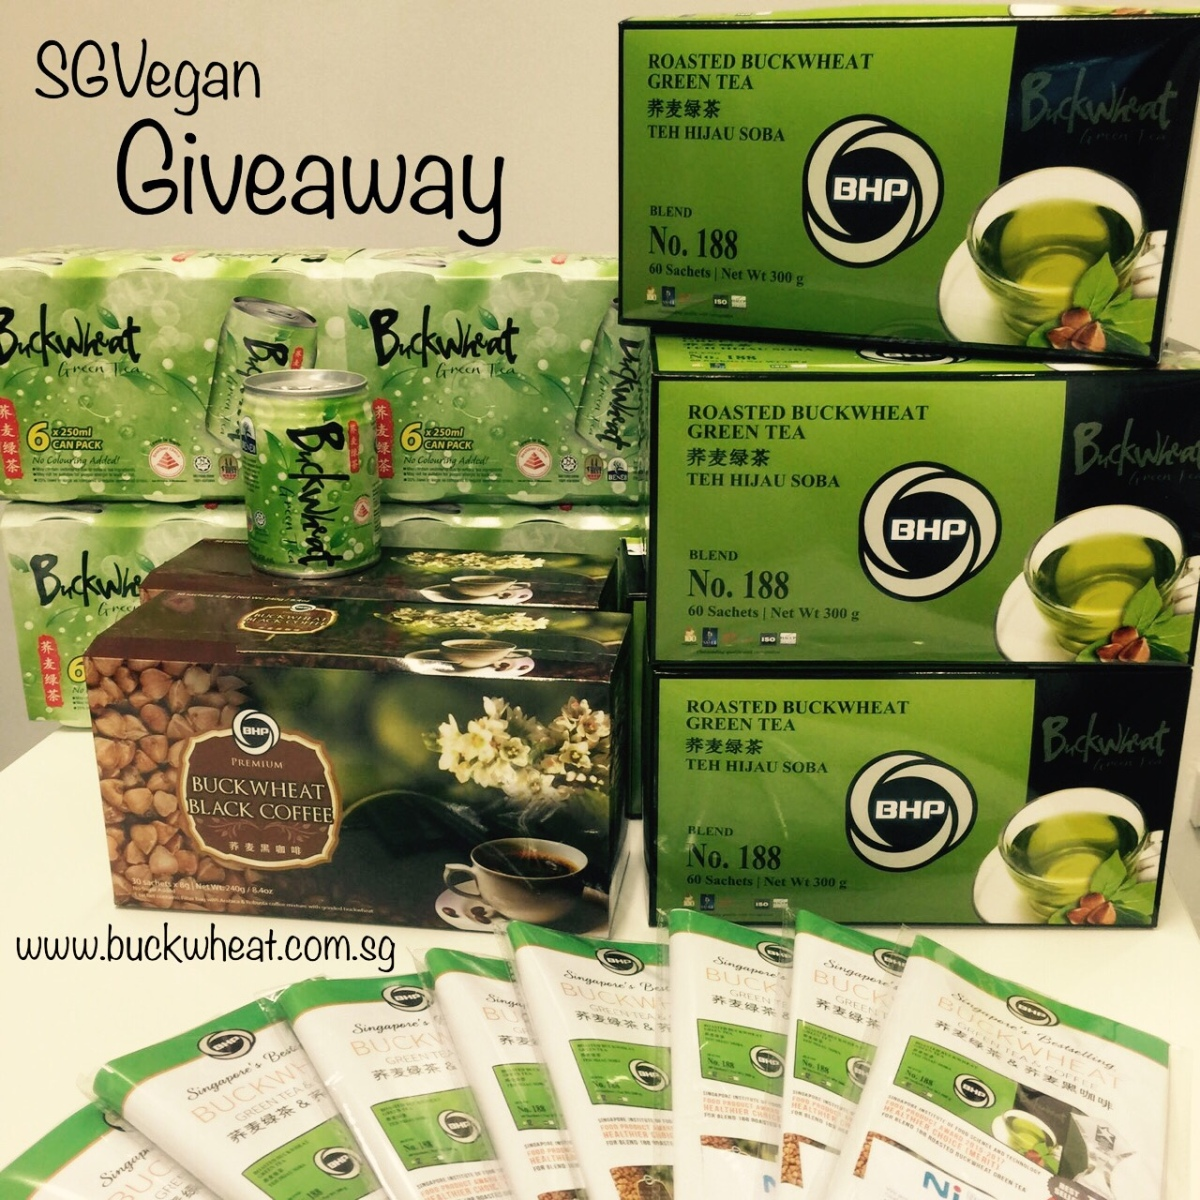 Winners for Roasted Buckwheat Green Tea andCoffee